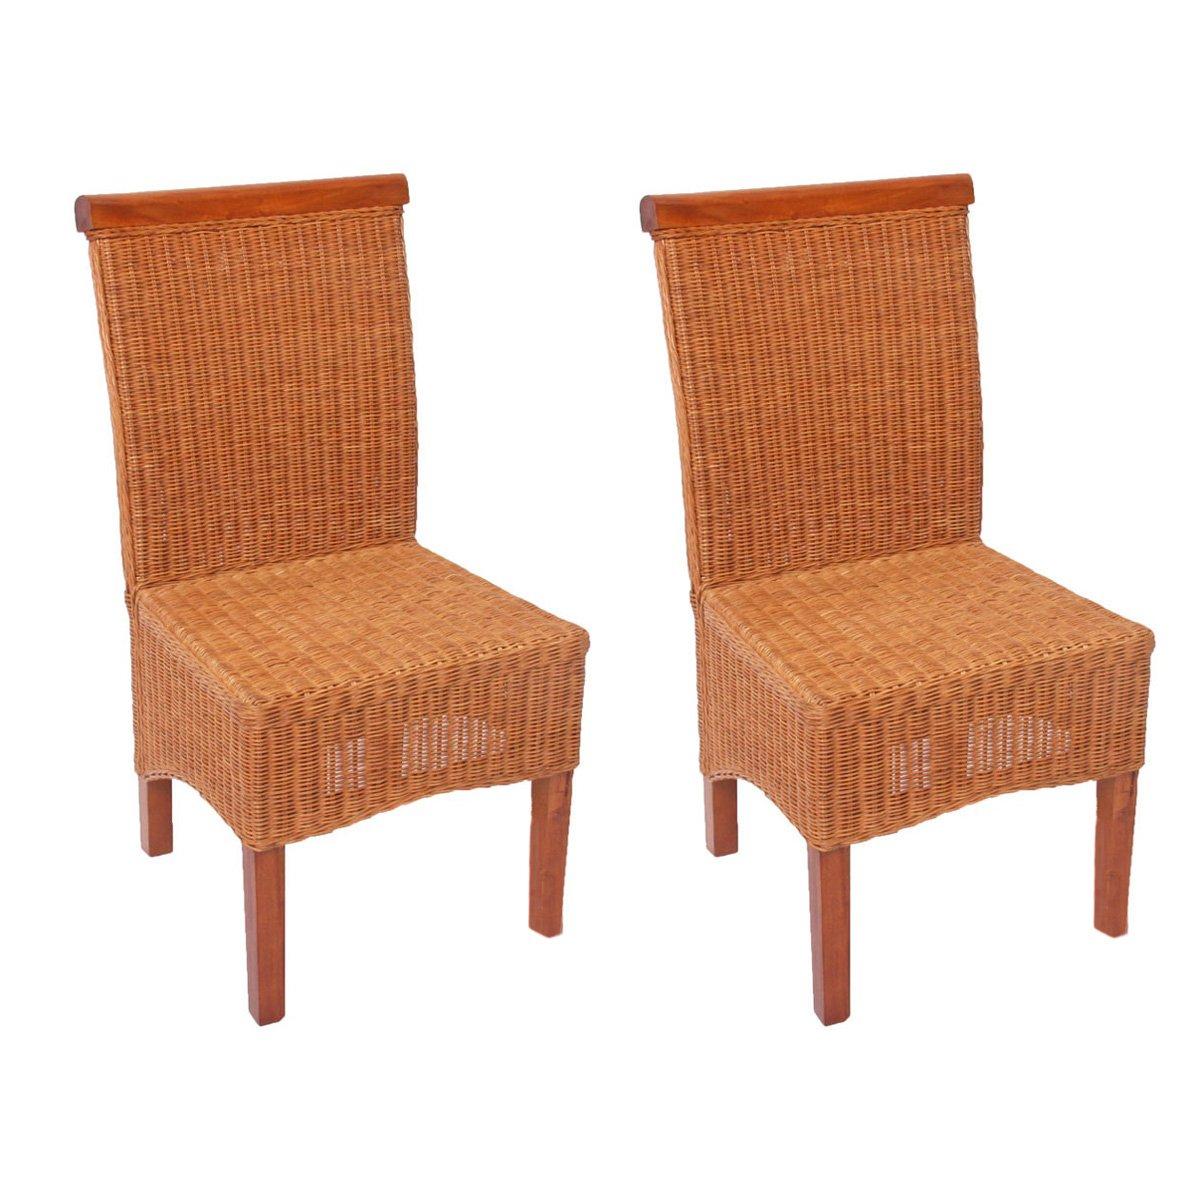 Mendler 2x Esszimmerstuhl Korbstuhl Stuhl M42, Rattan Rattan Rattan  ohne Sitzkissen 9c2bf9